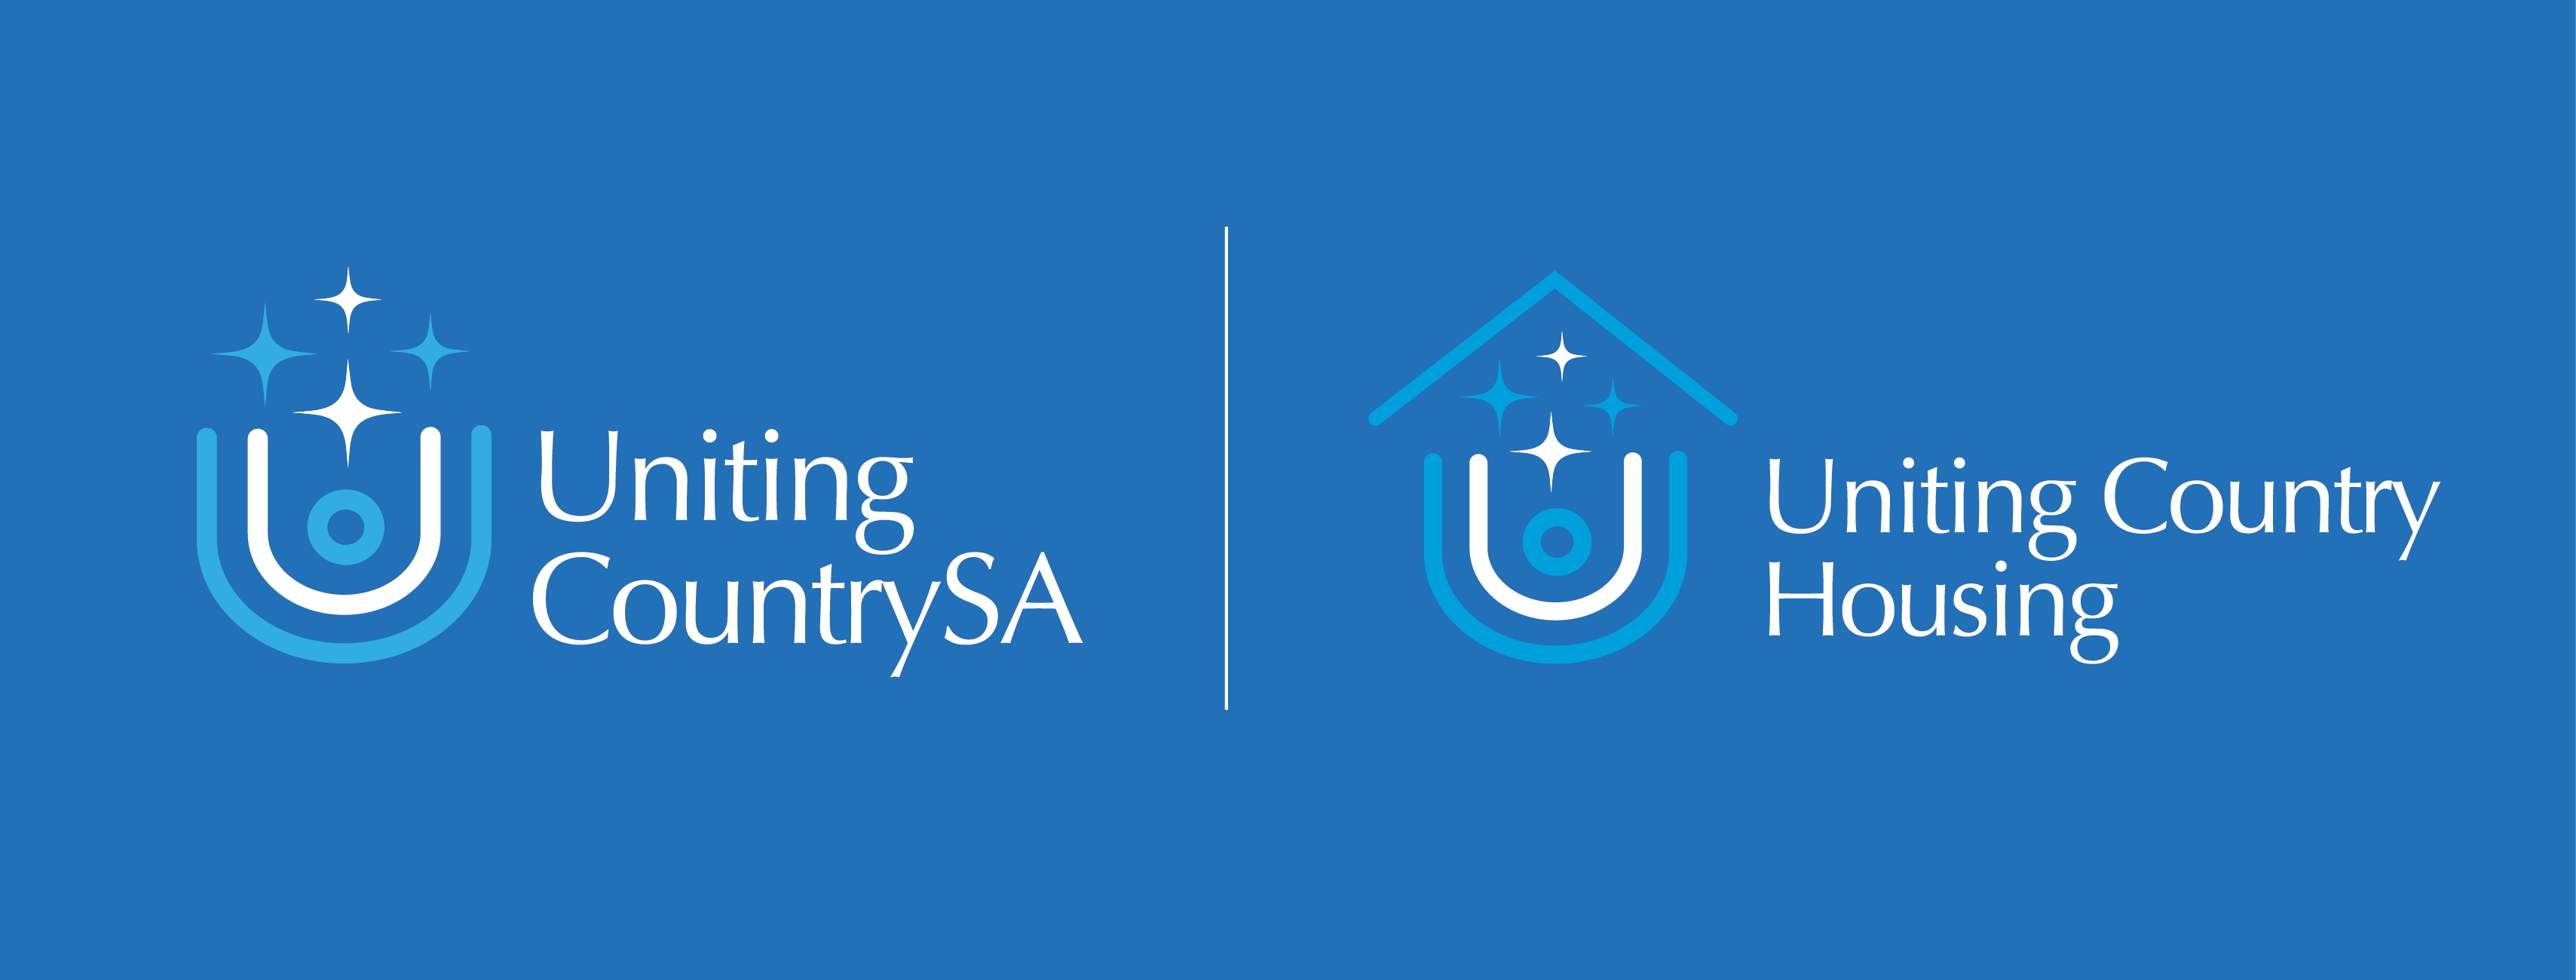 Uniting Country SA